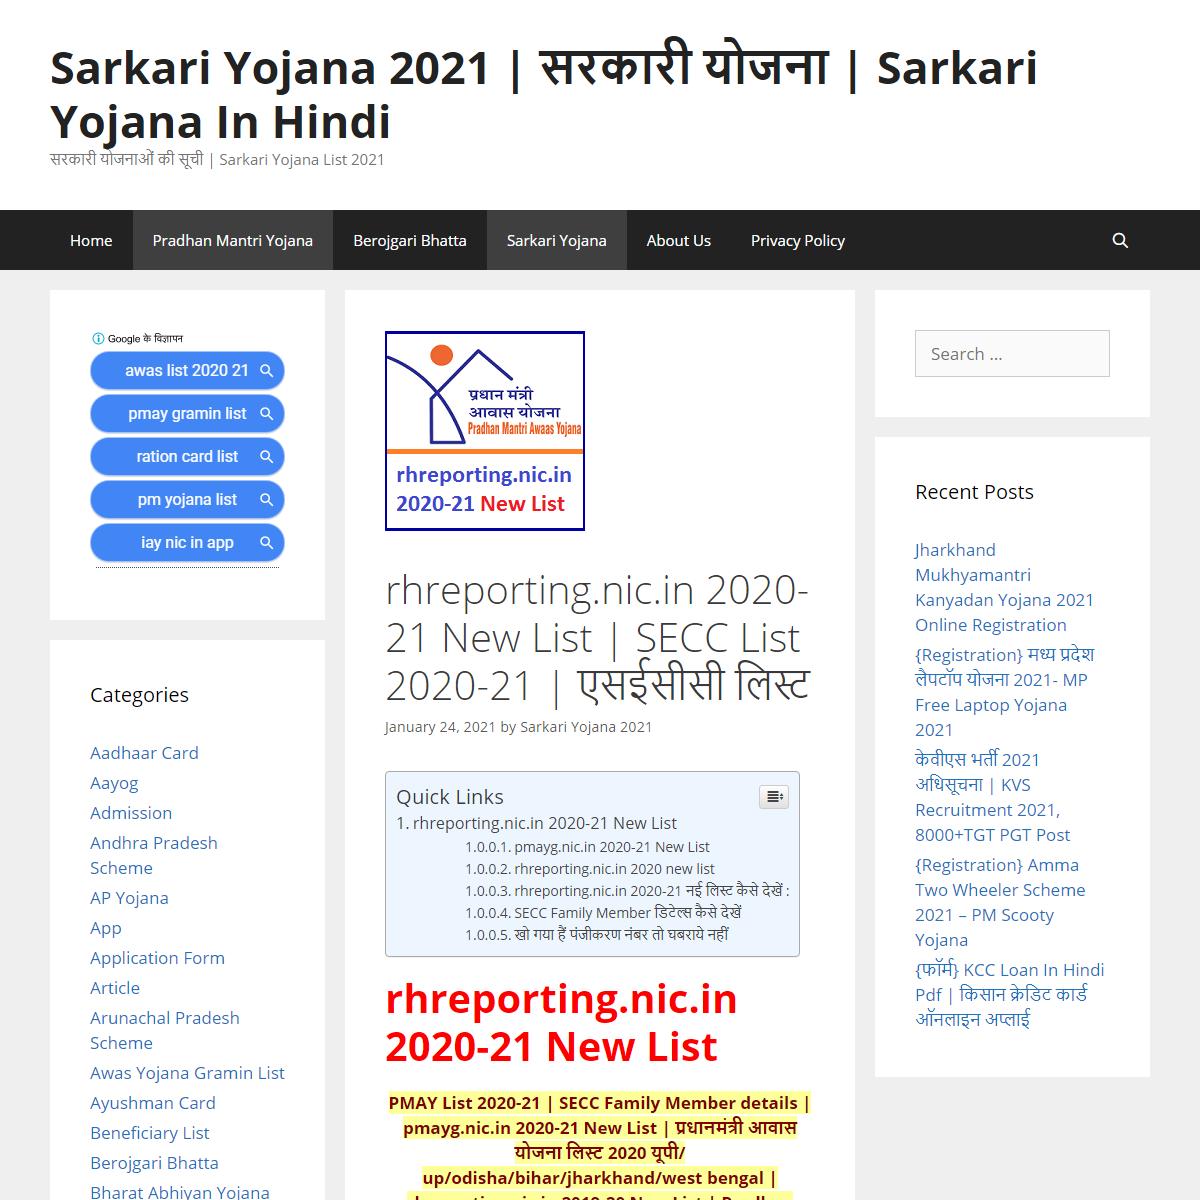 rhreporting.nic.in 2020-21 New List - SECC List 2020-21 - एसईसीसी लिस्ट